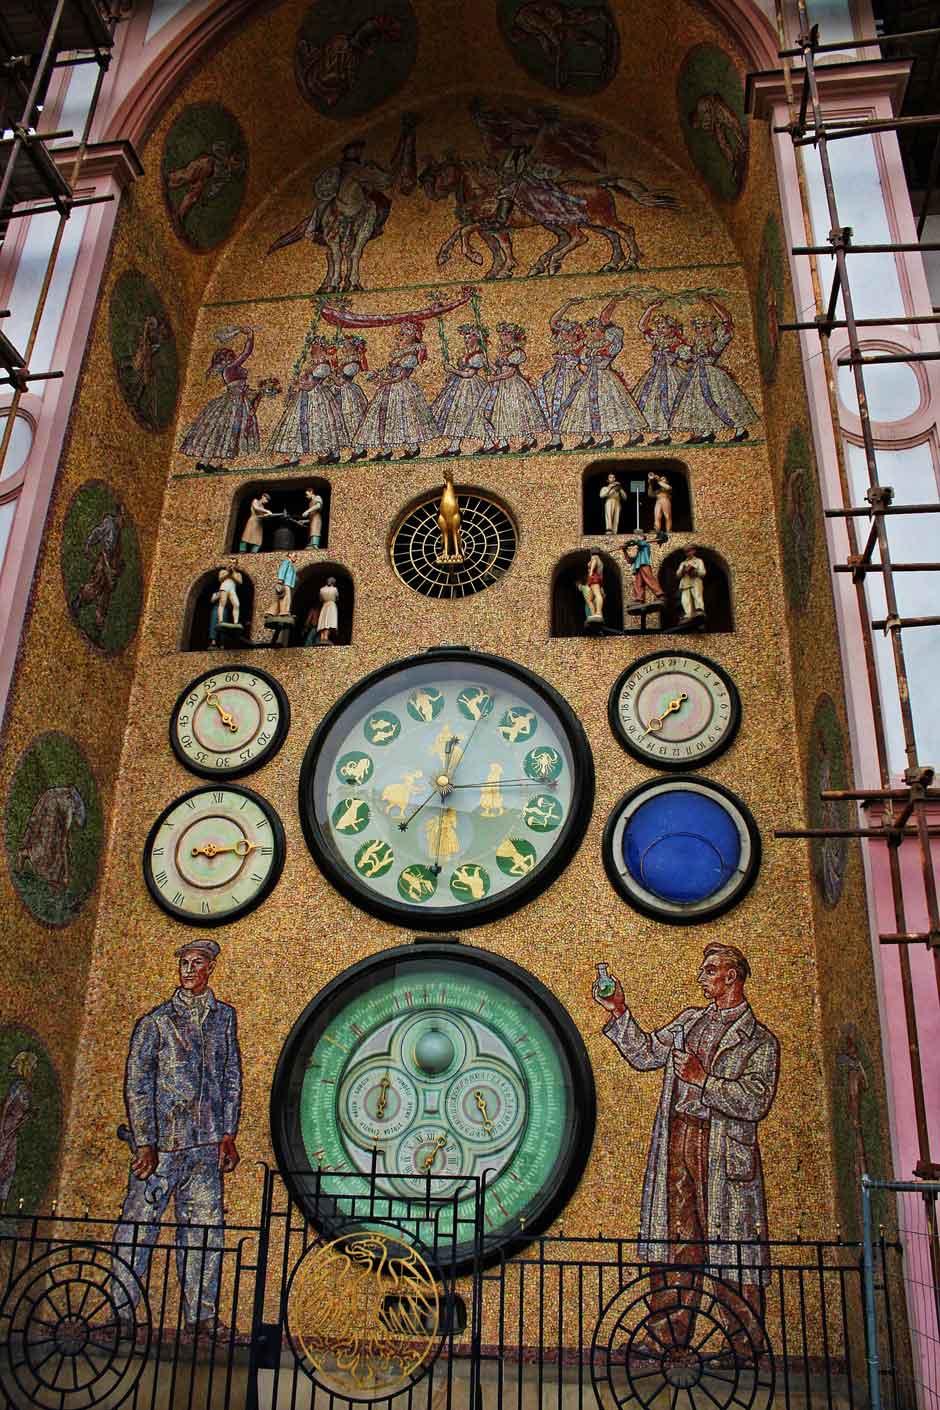 Viajar a Olomouc Moravia República Checa El reloj de Olomouc | Tu Gran Viaje